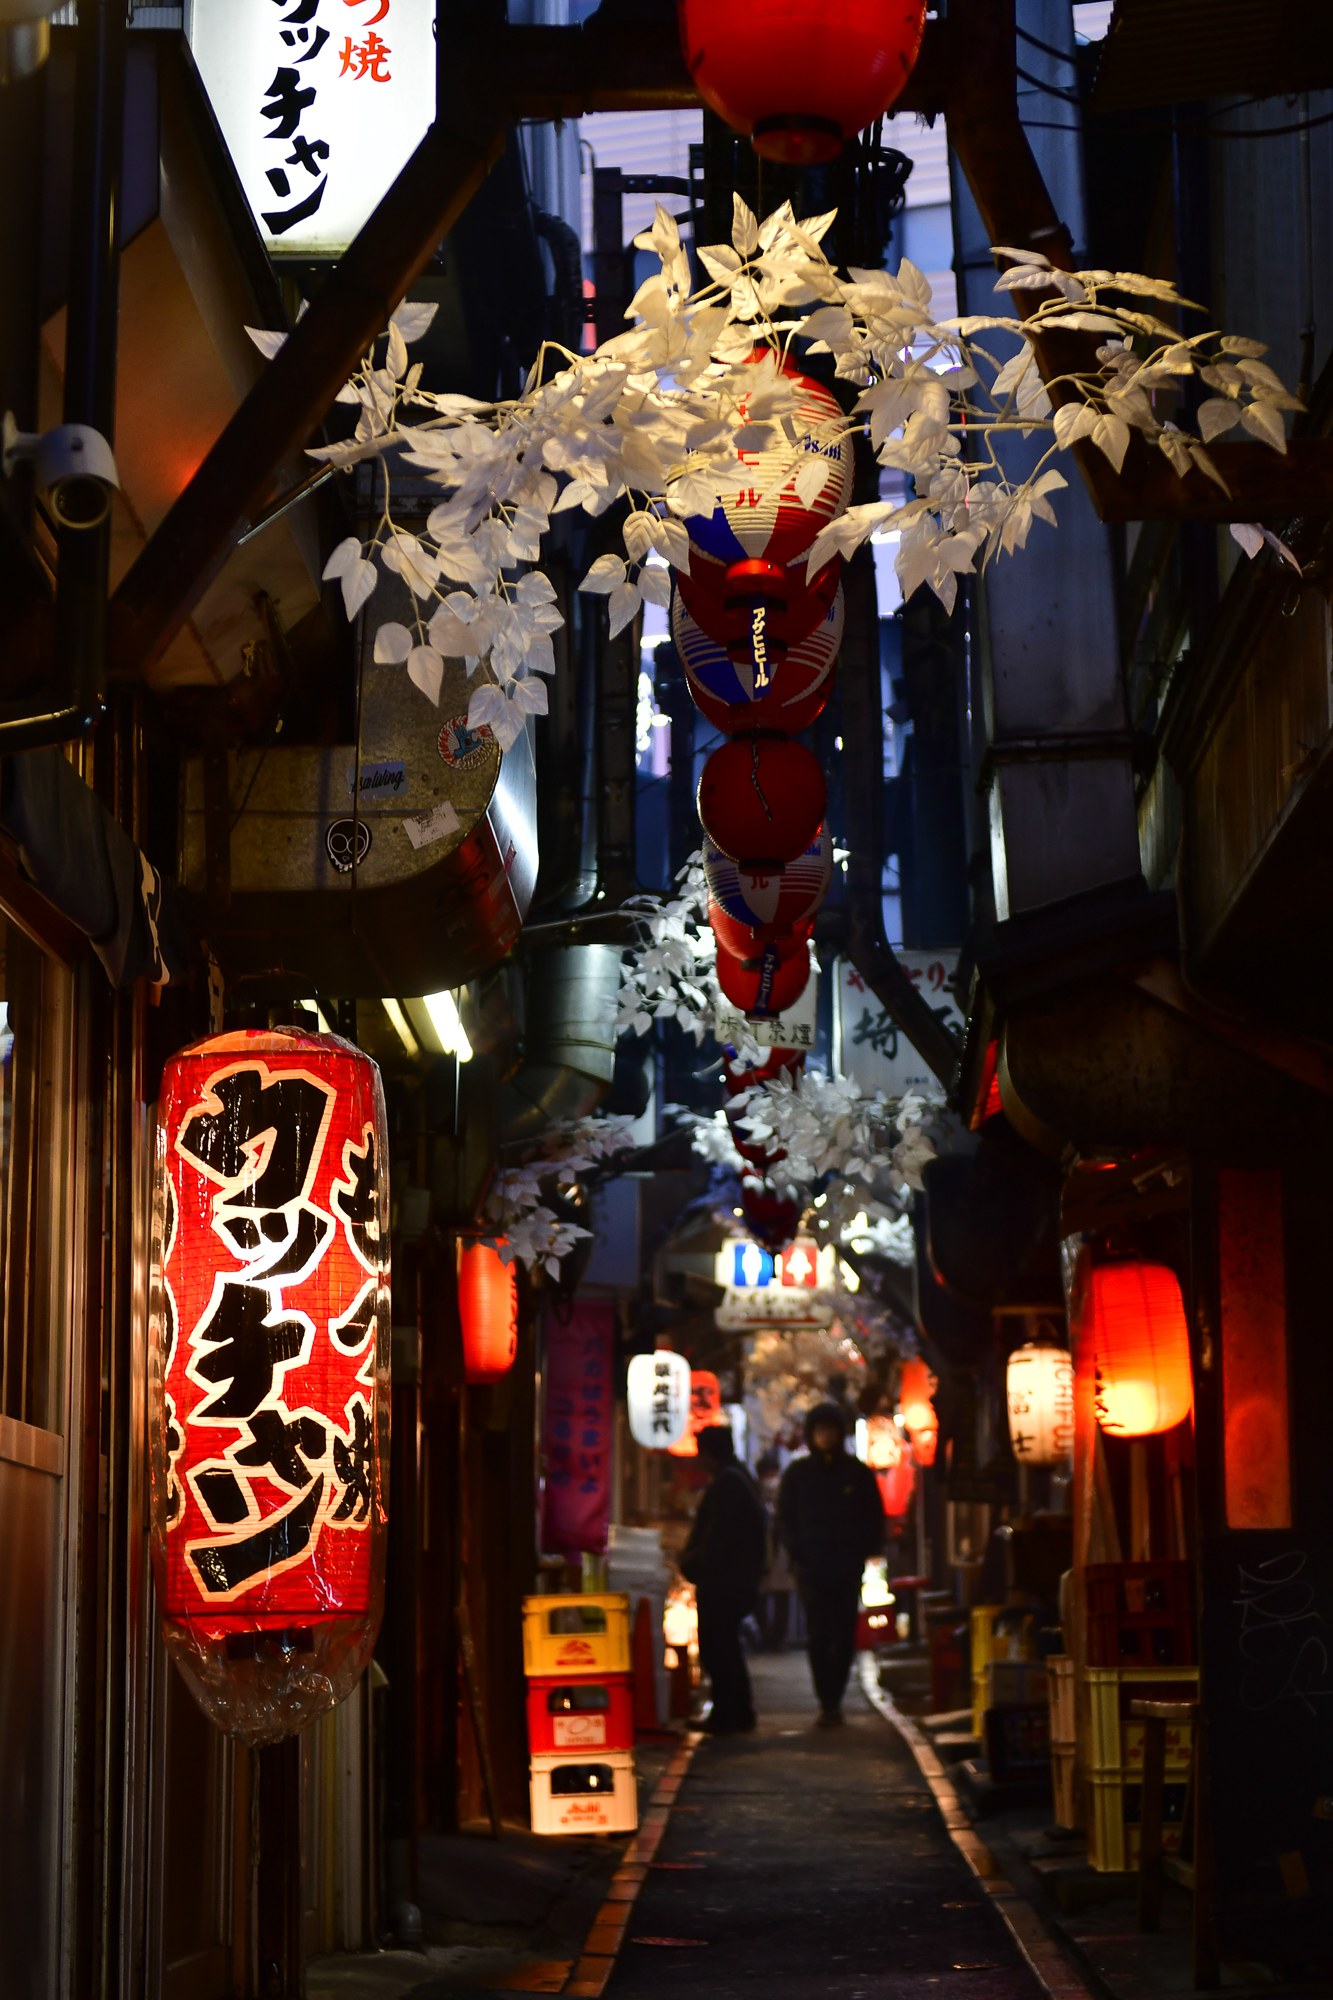 Omoide Yokocho (Piss Alley)  PHOTOGRAPHY: ALEXANDER J.E. BRADLEY • NIKON D500 • AF-S NIKKOR 24-70MM Ƒ/2.8G ED @ 48MM • Ƒ/2.8 • 1/60 • ISO 400